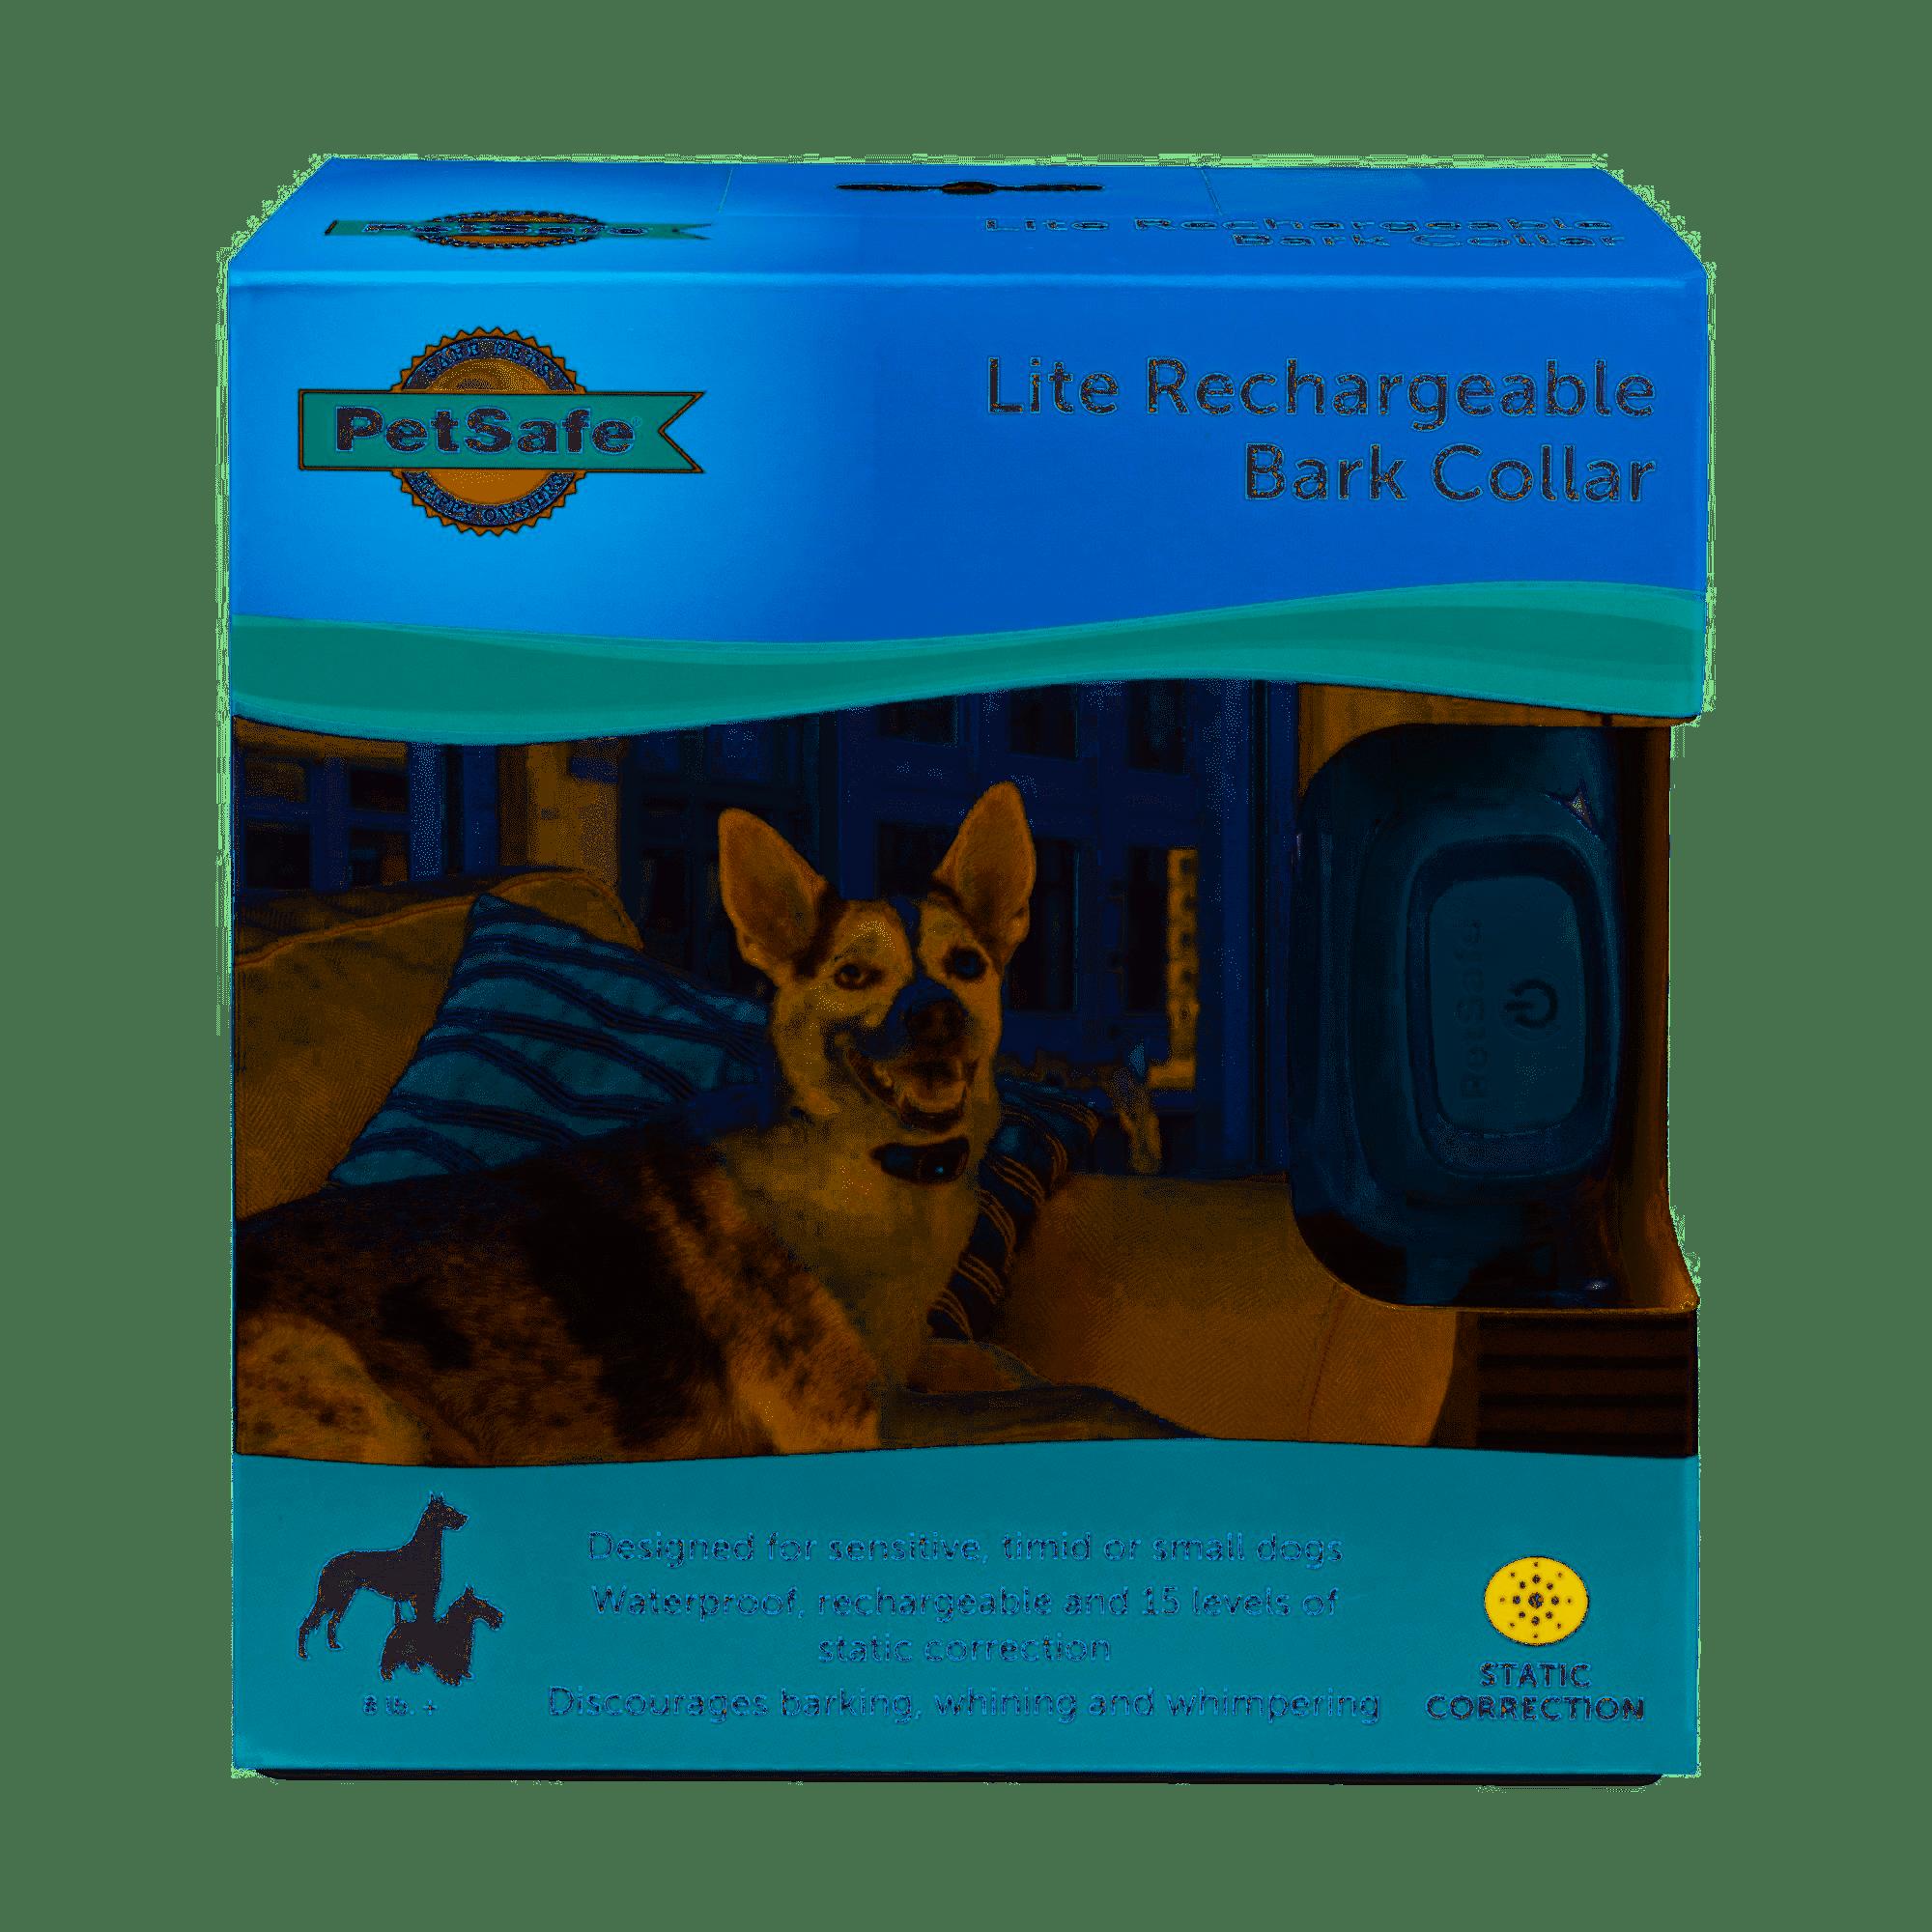 PetSafe Rechargeable Bark Control Dog Training Collar, Lite